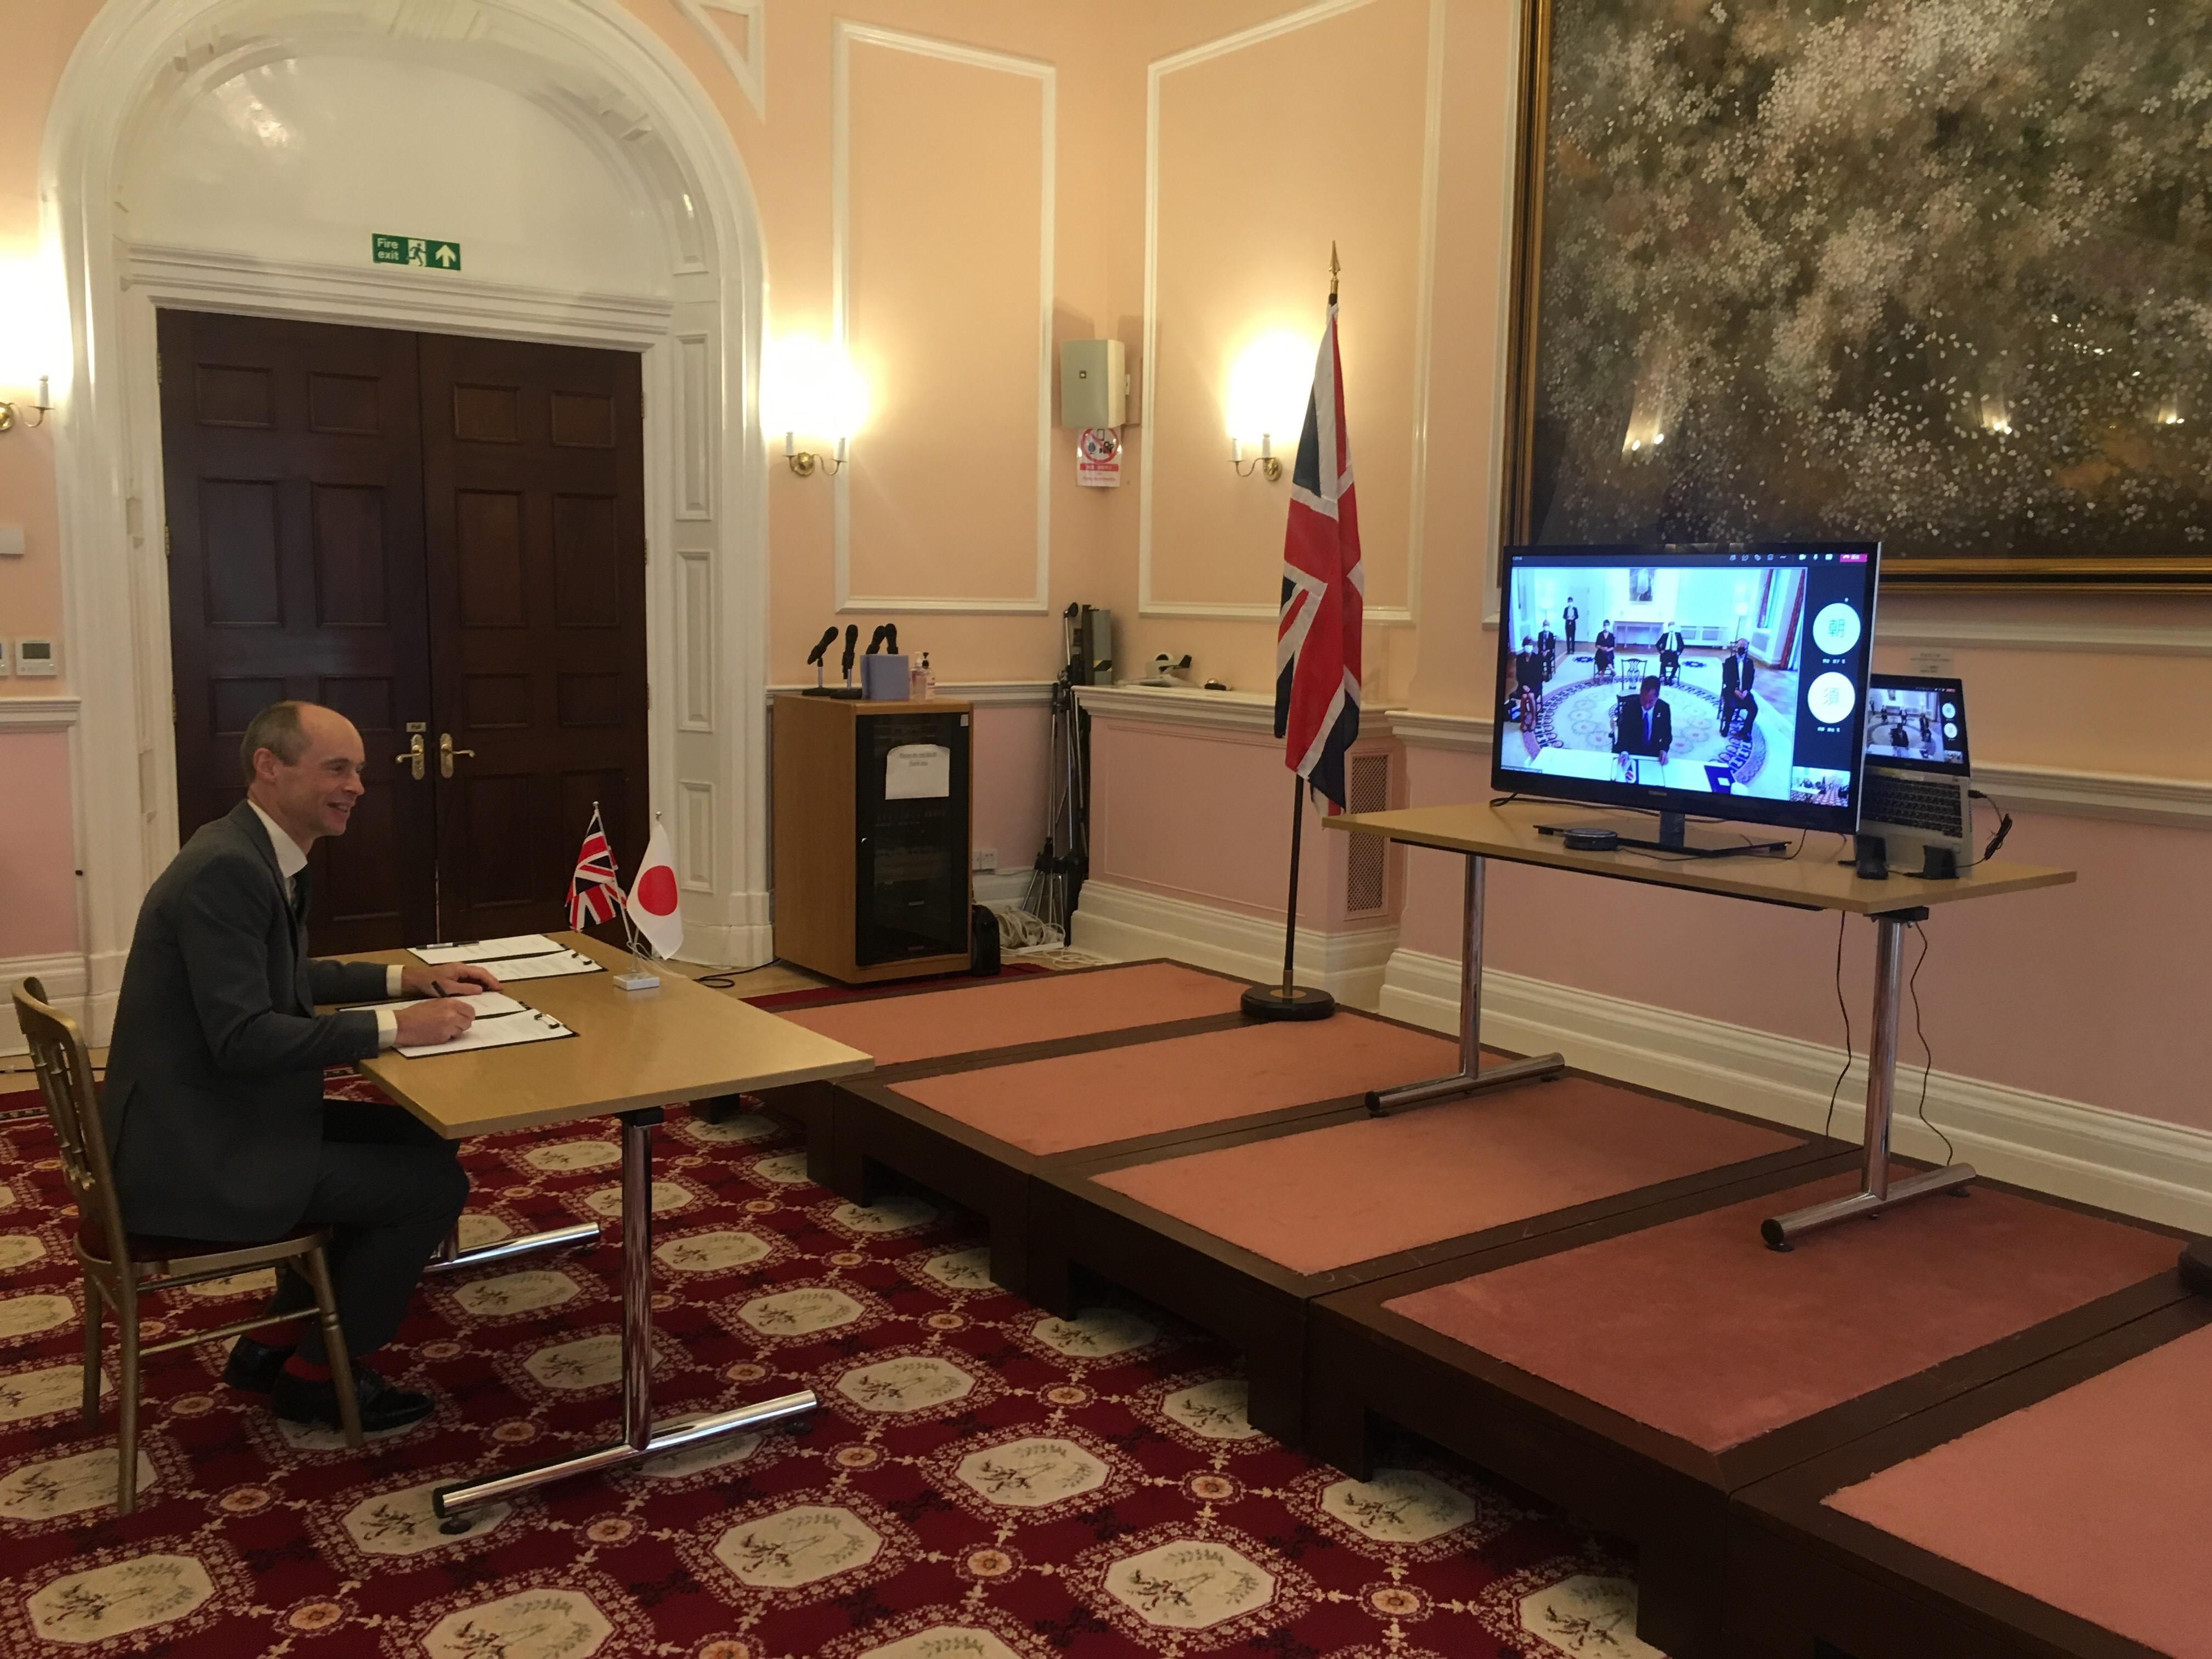 UK Space Agency CEO, signing a Memorandum of Cooperation with the Japanese Aerospace Exploration Agency (JAXA).